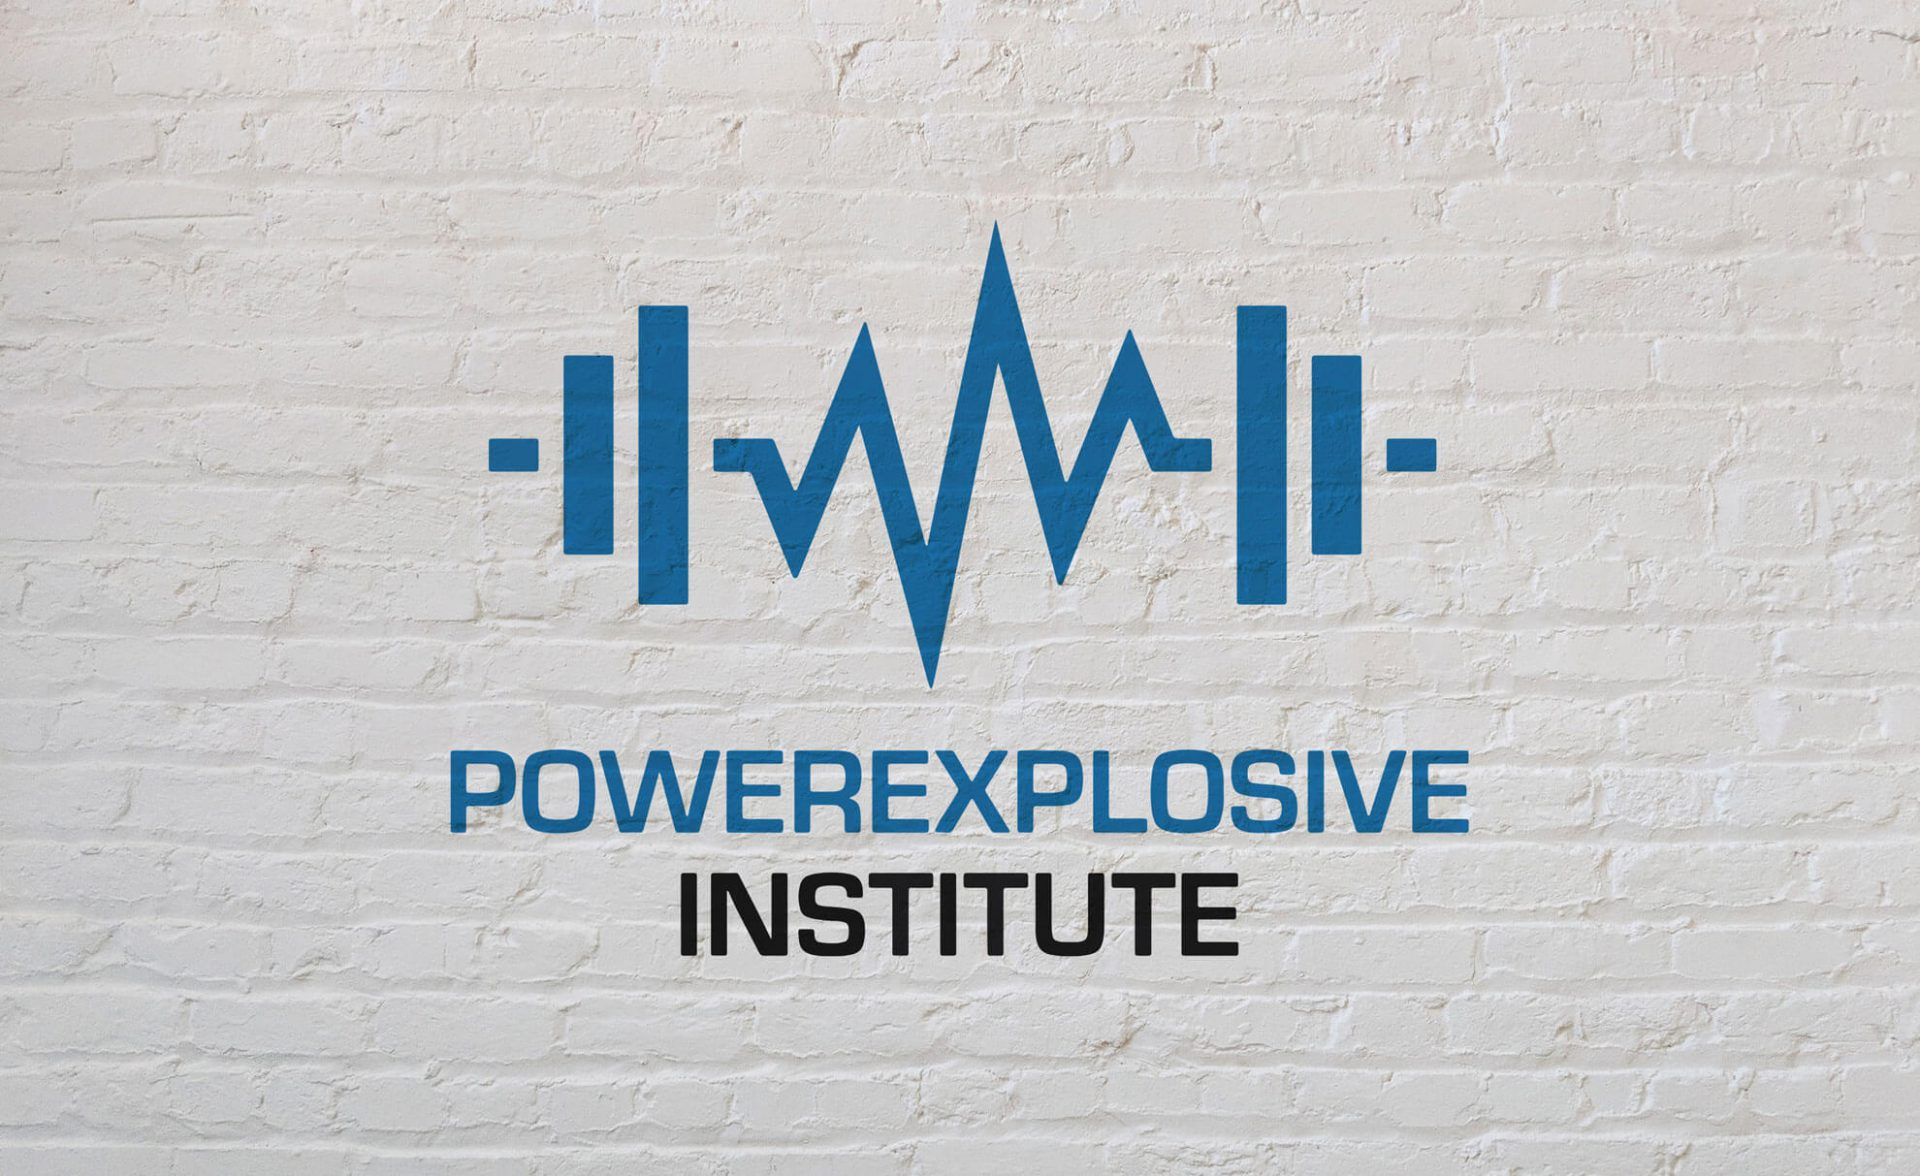 Vinilo porfolio diseño powerexplosive institute